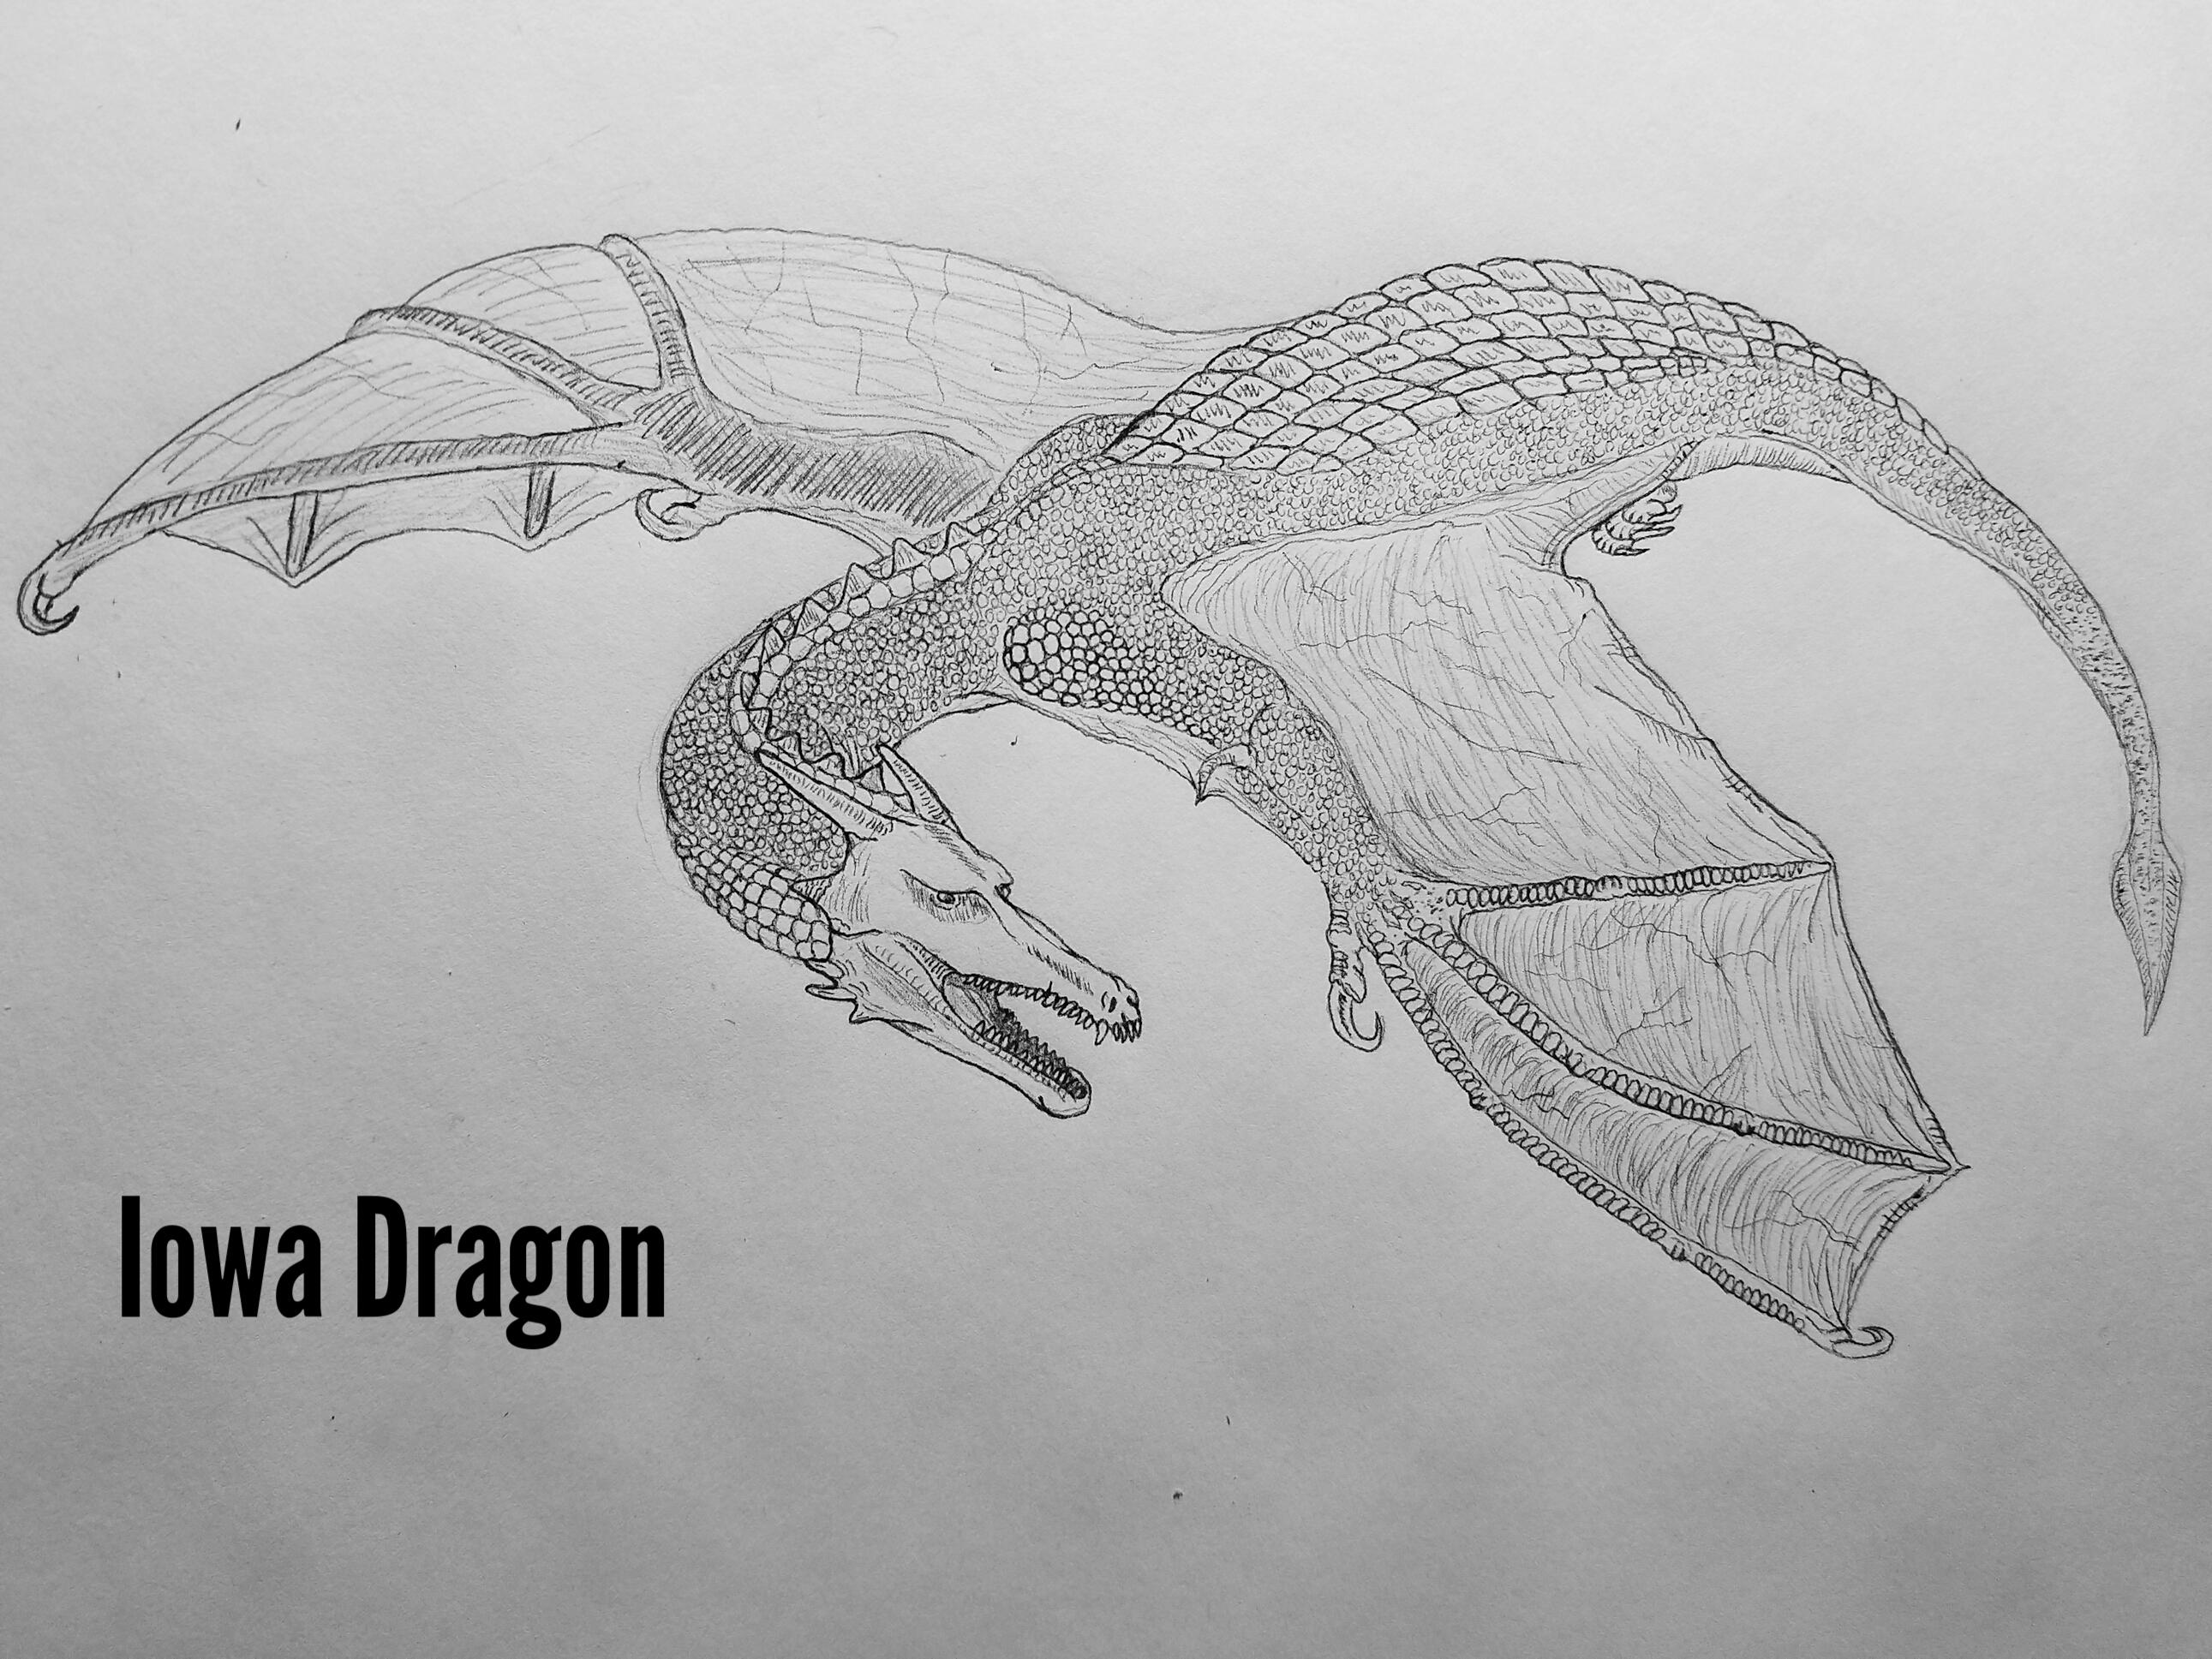 Iowa Dragons